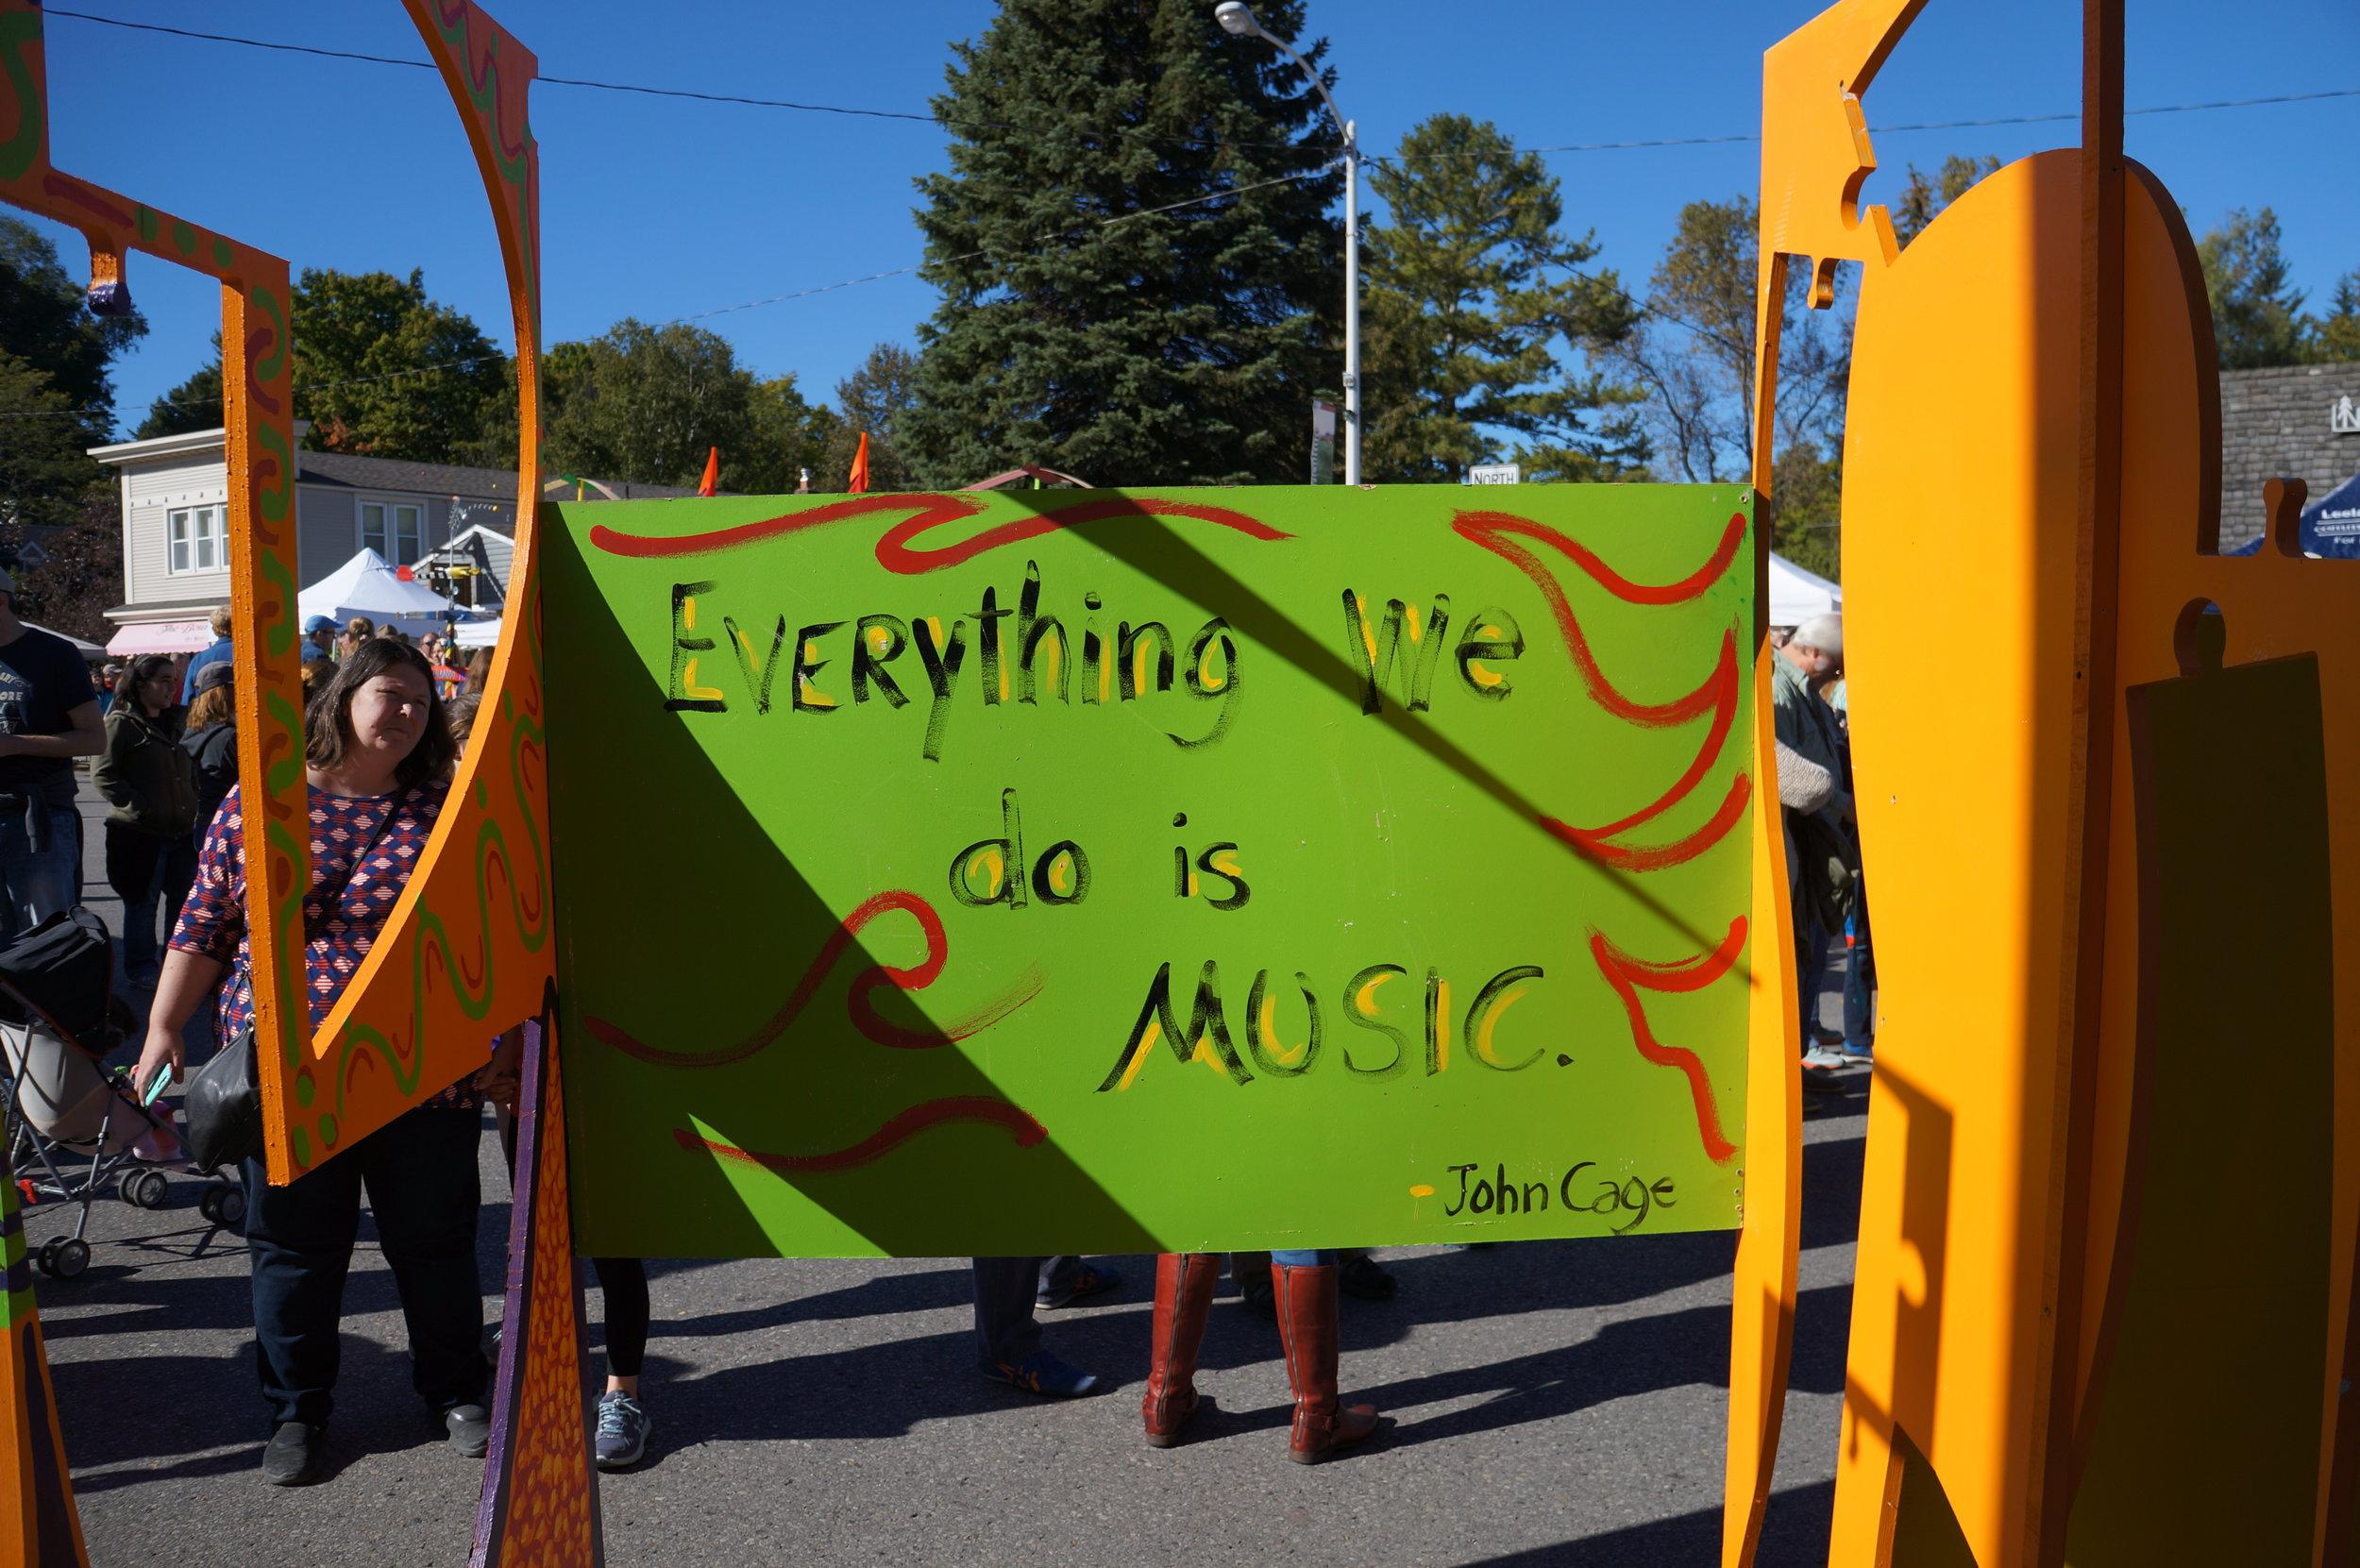 Everything we do is Music - philg.JPG